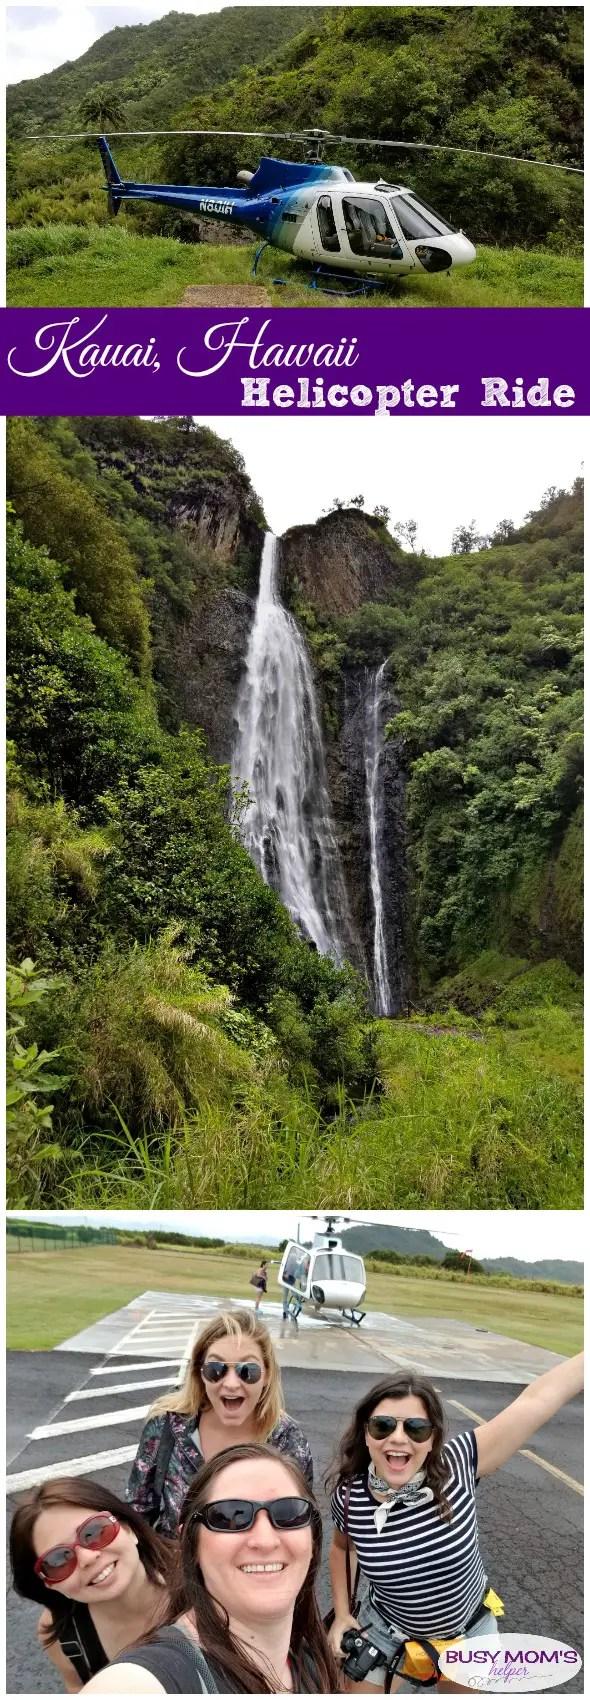 Kauai, Hawaii Helicopter Ride #ad #KauaiDiscovery #hawaii #travel #BMHTravels #kauai